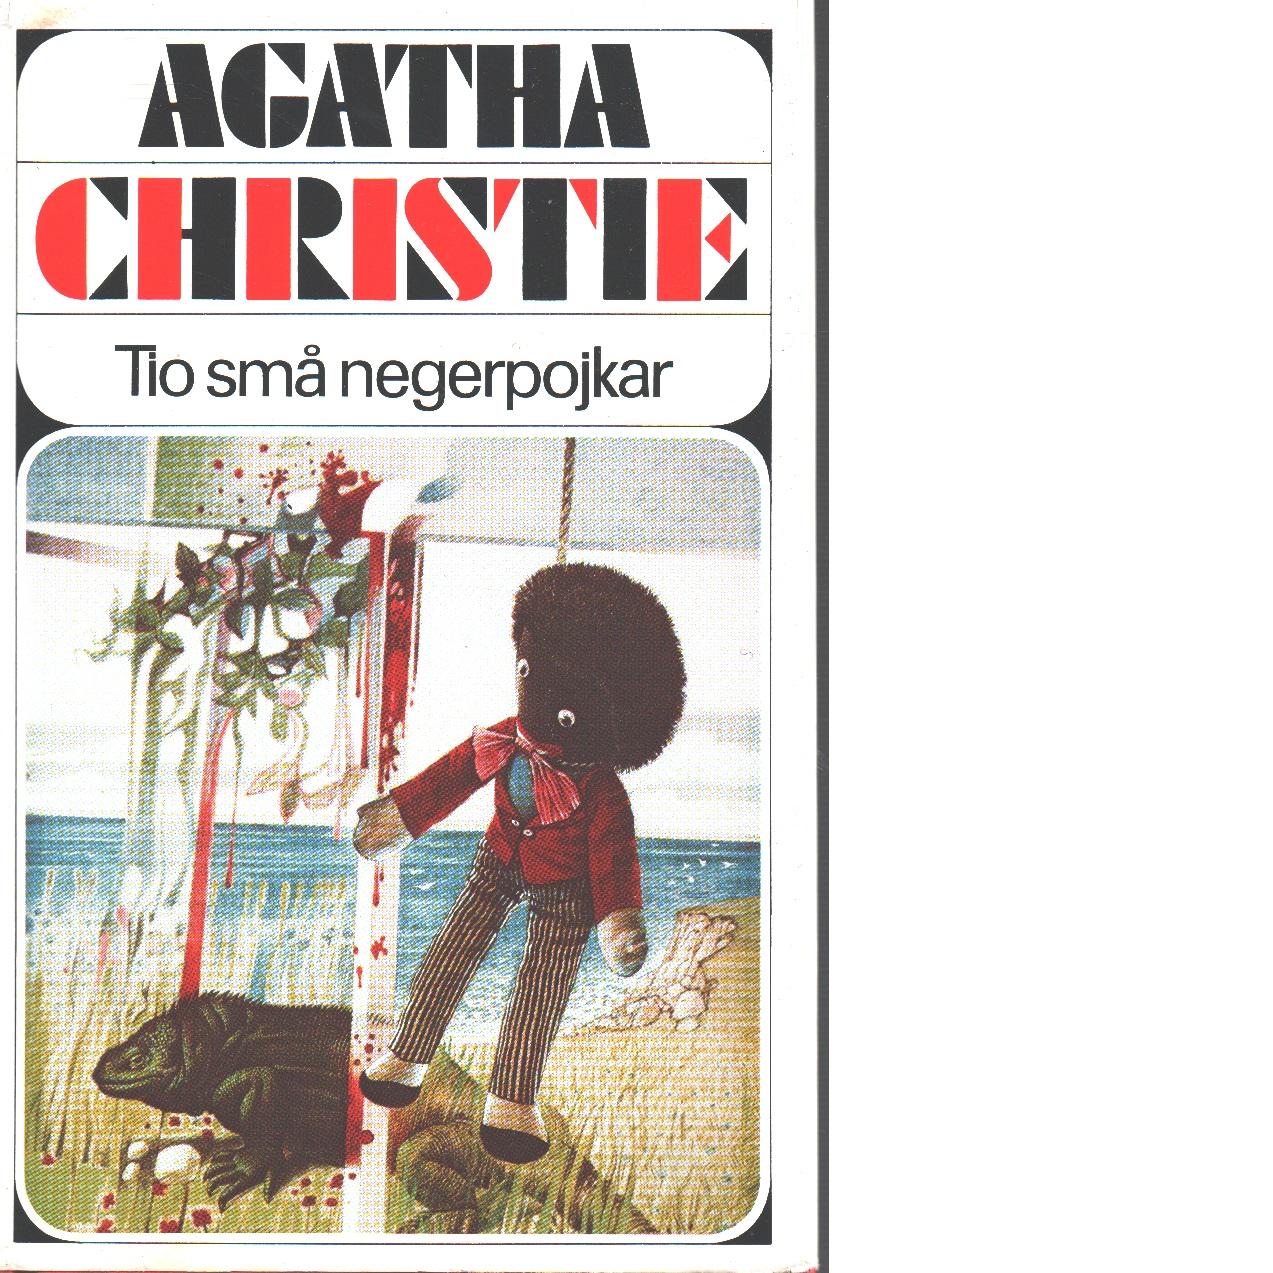 Tio små negerpojkar - Christie, Agatha